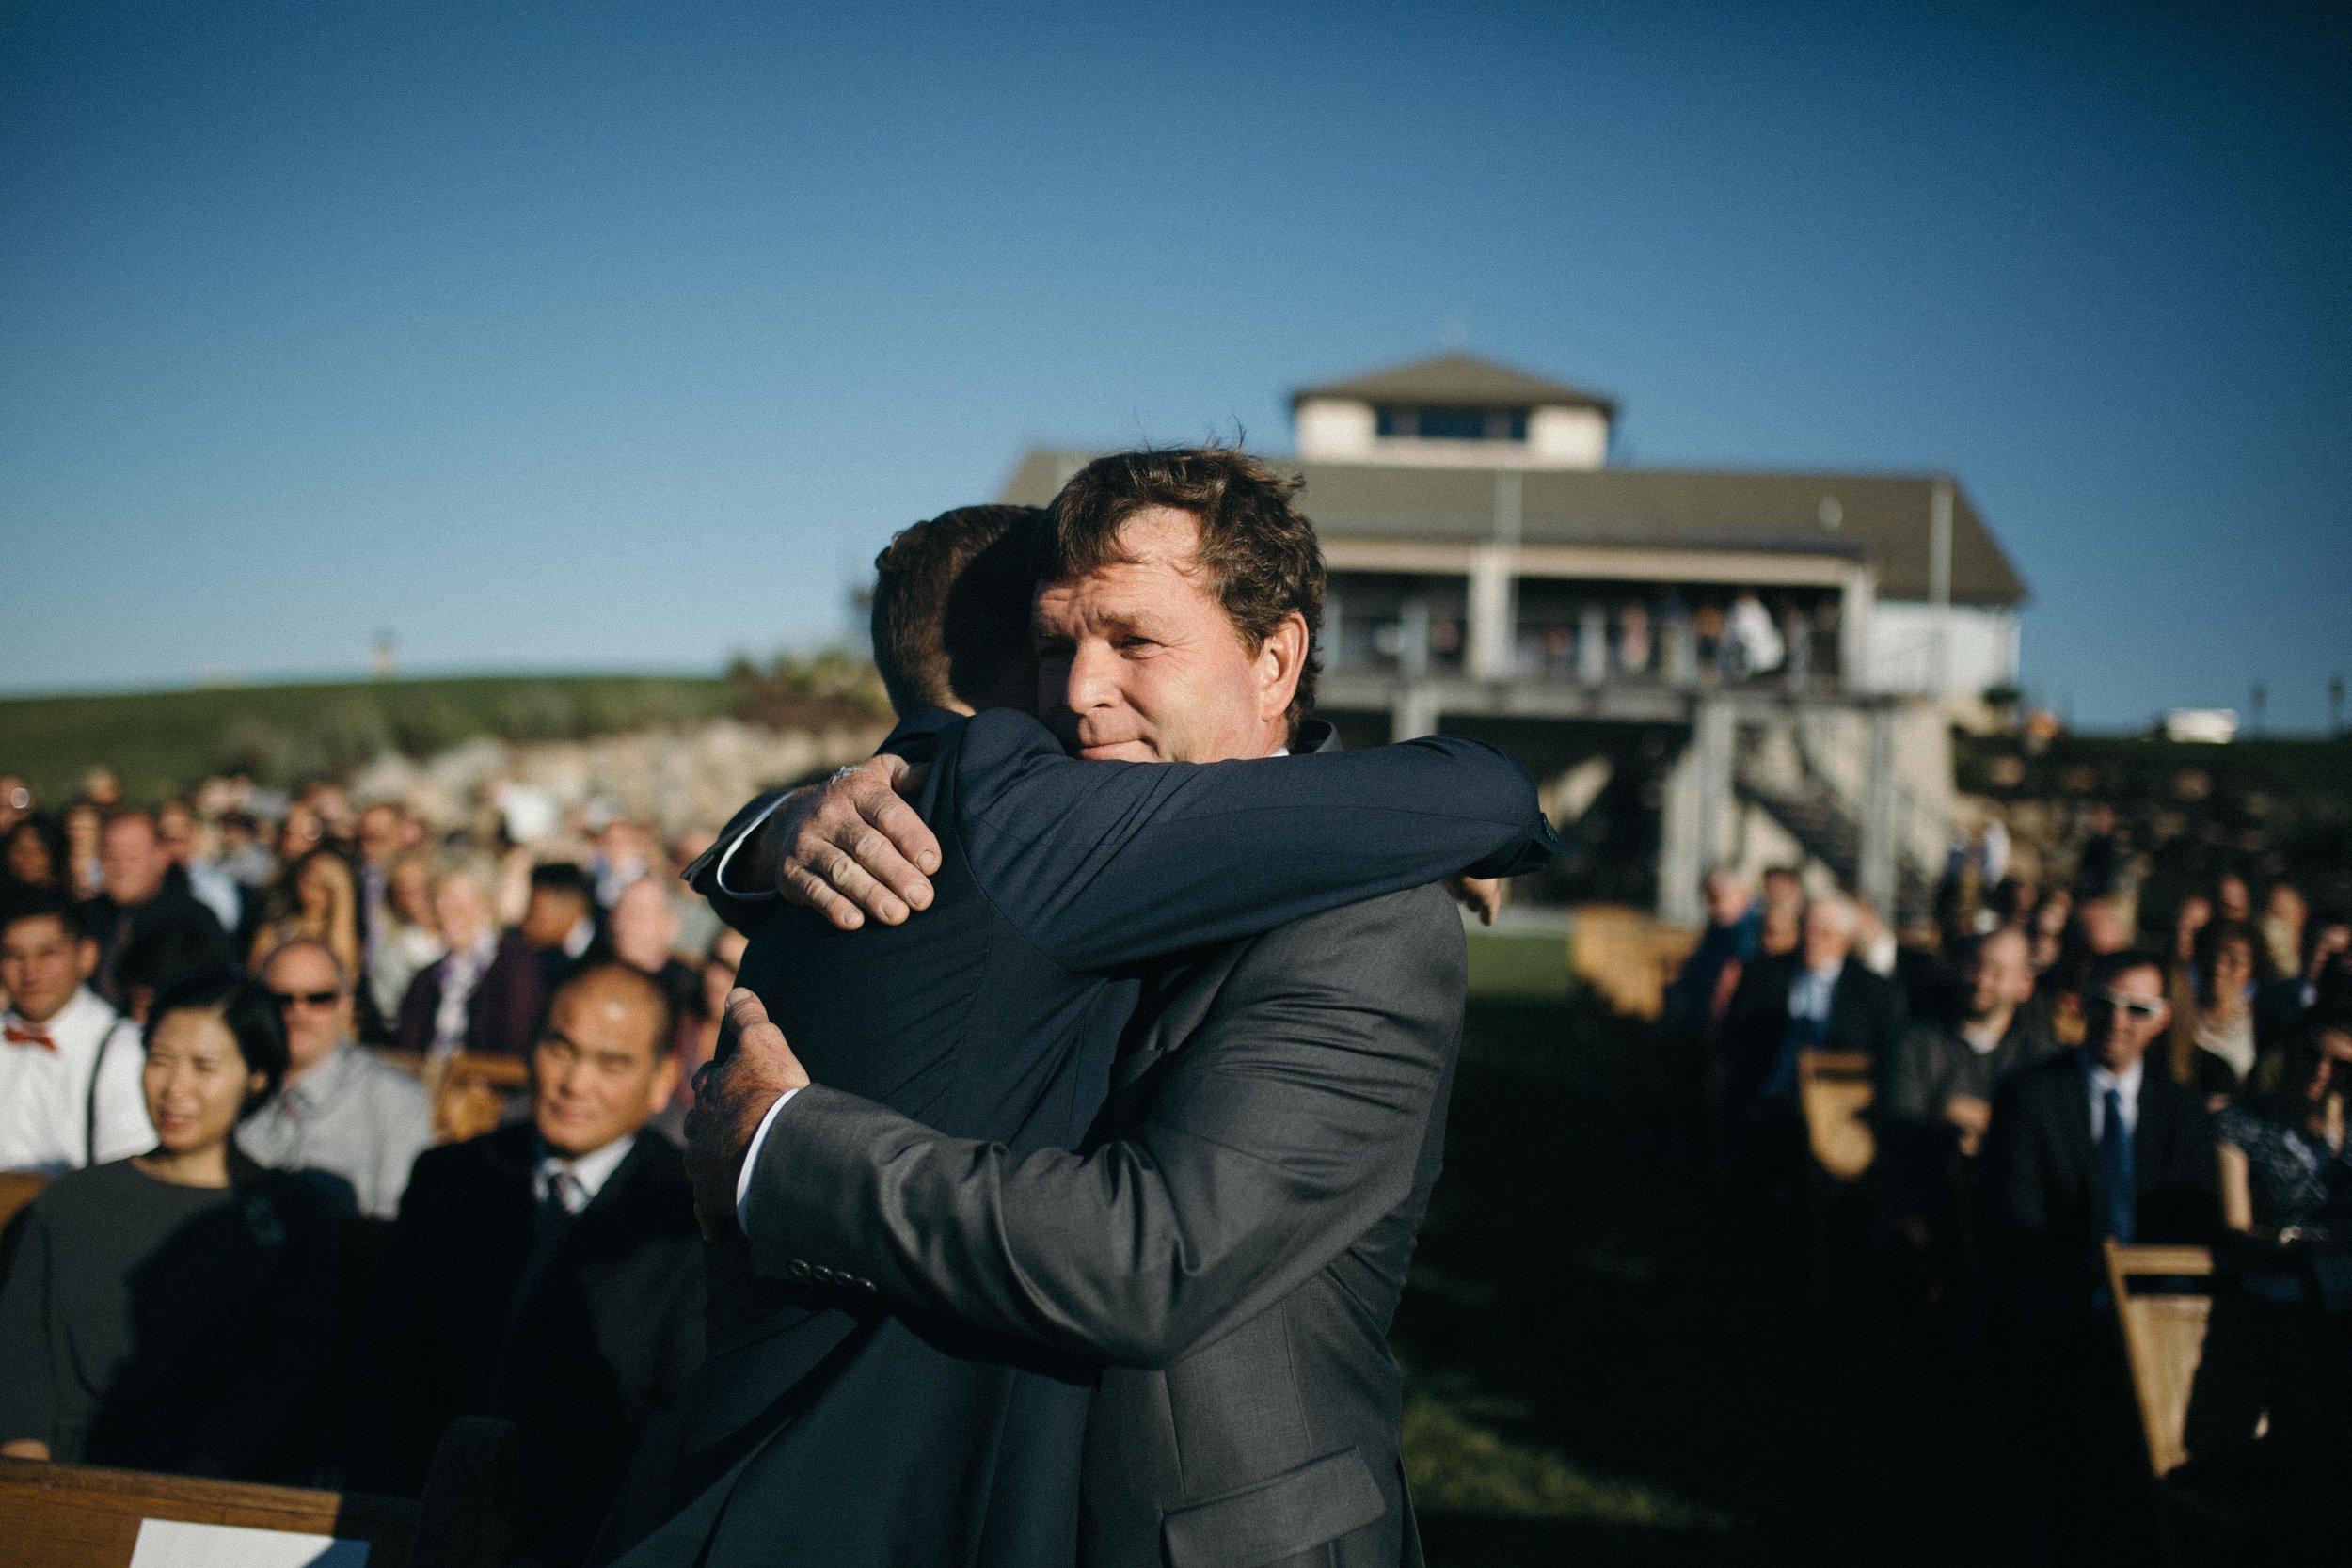 bailey-jared-wedding-blog-49.jpg